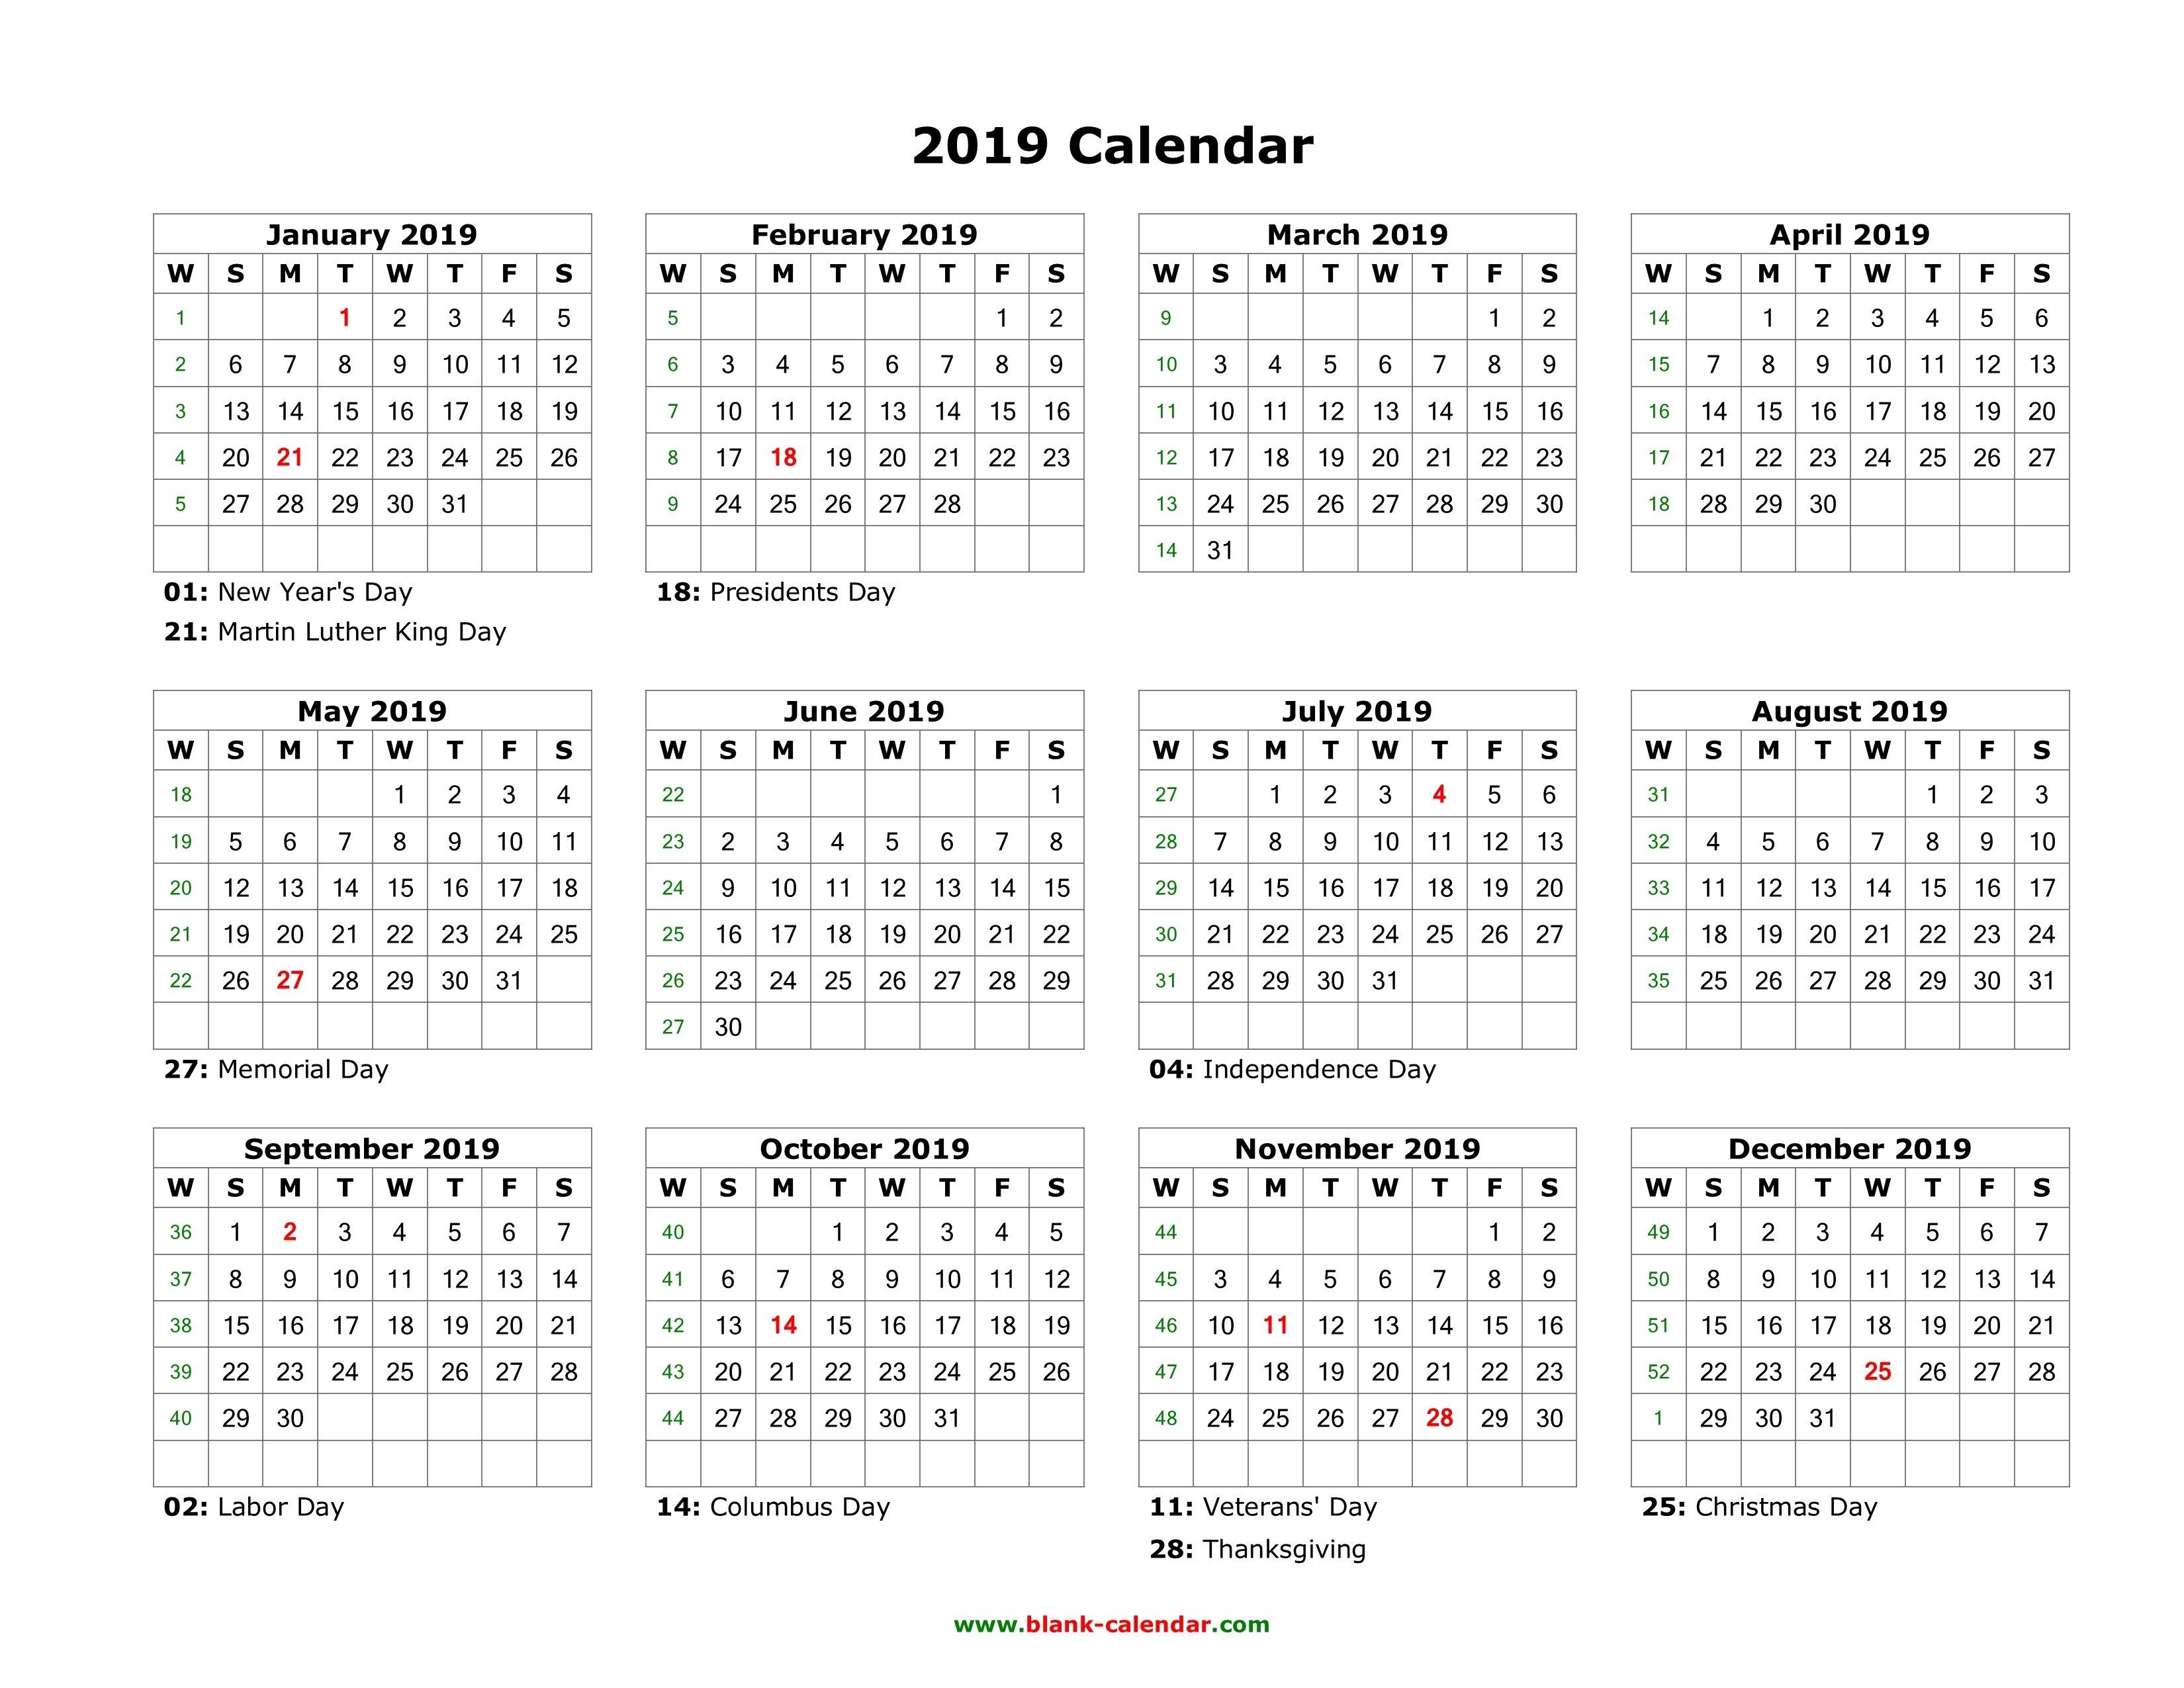 Blank Calendar 2019 | Free Download Calendar Templates Calendar 2019 Doc